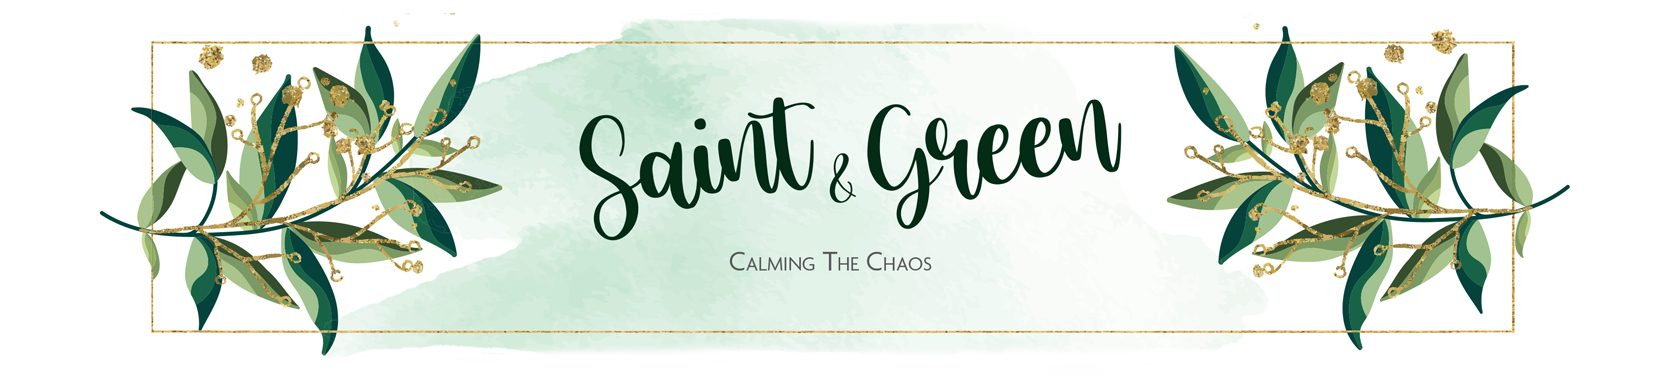 Saint & Green